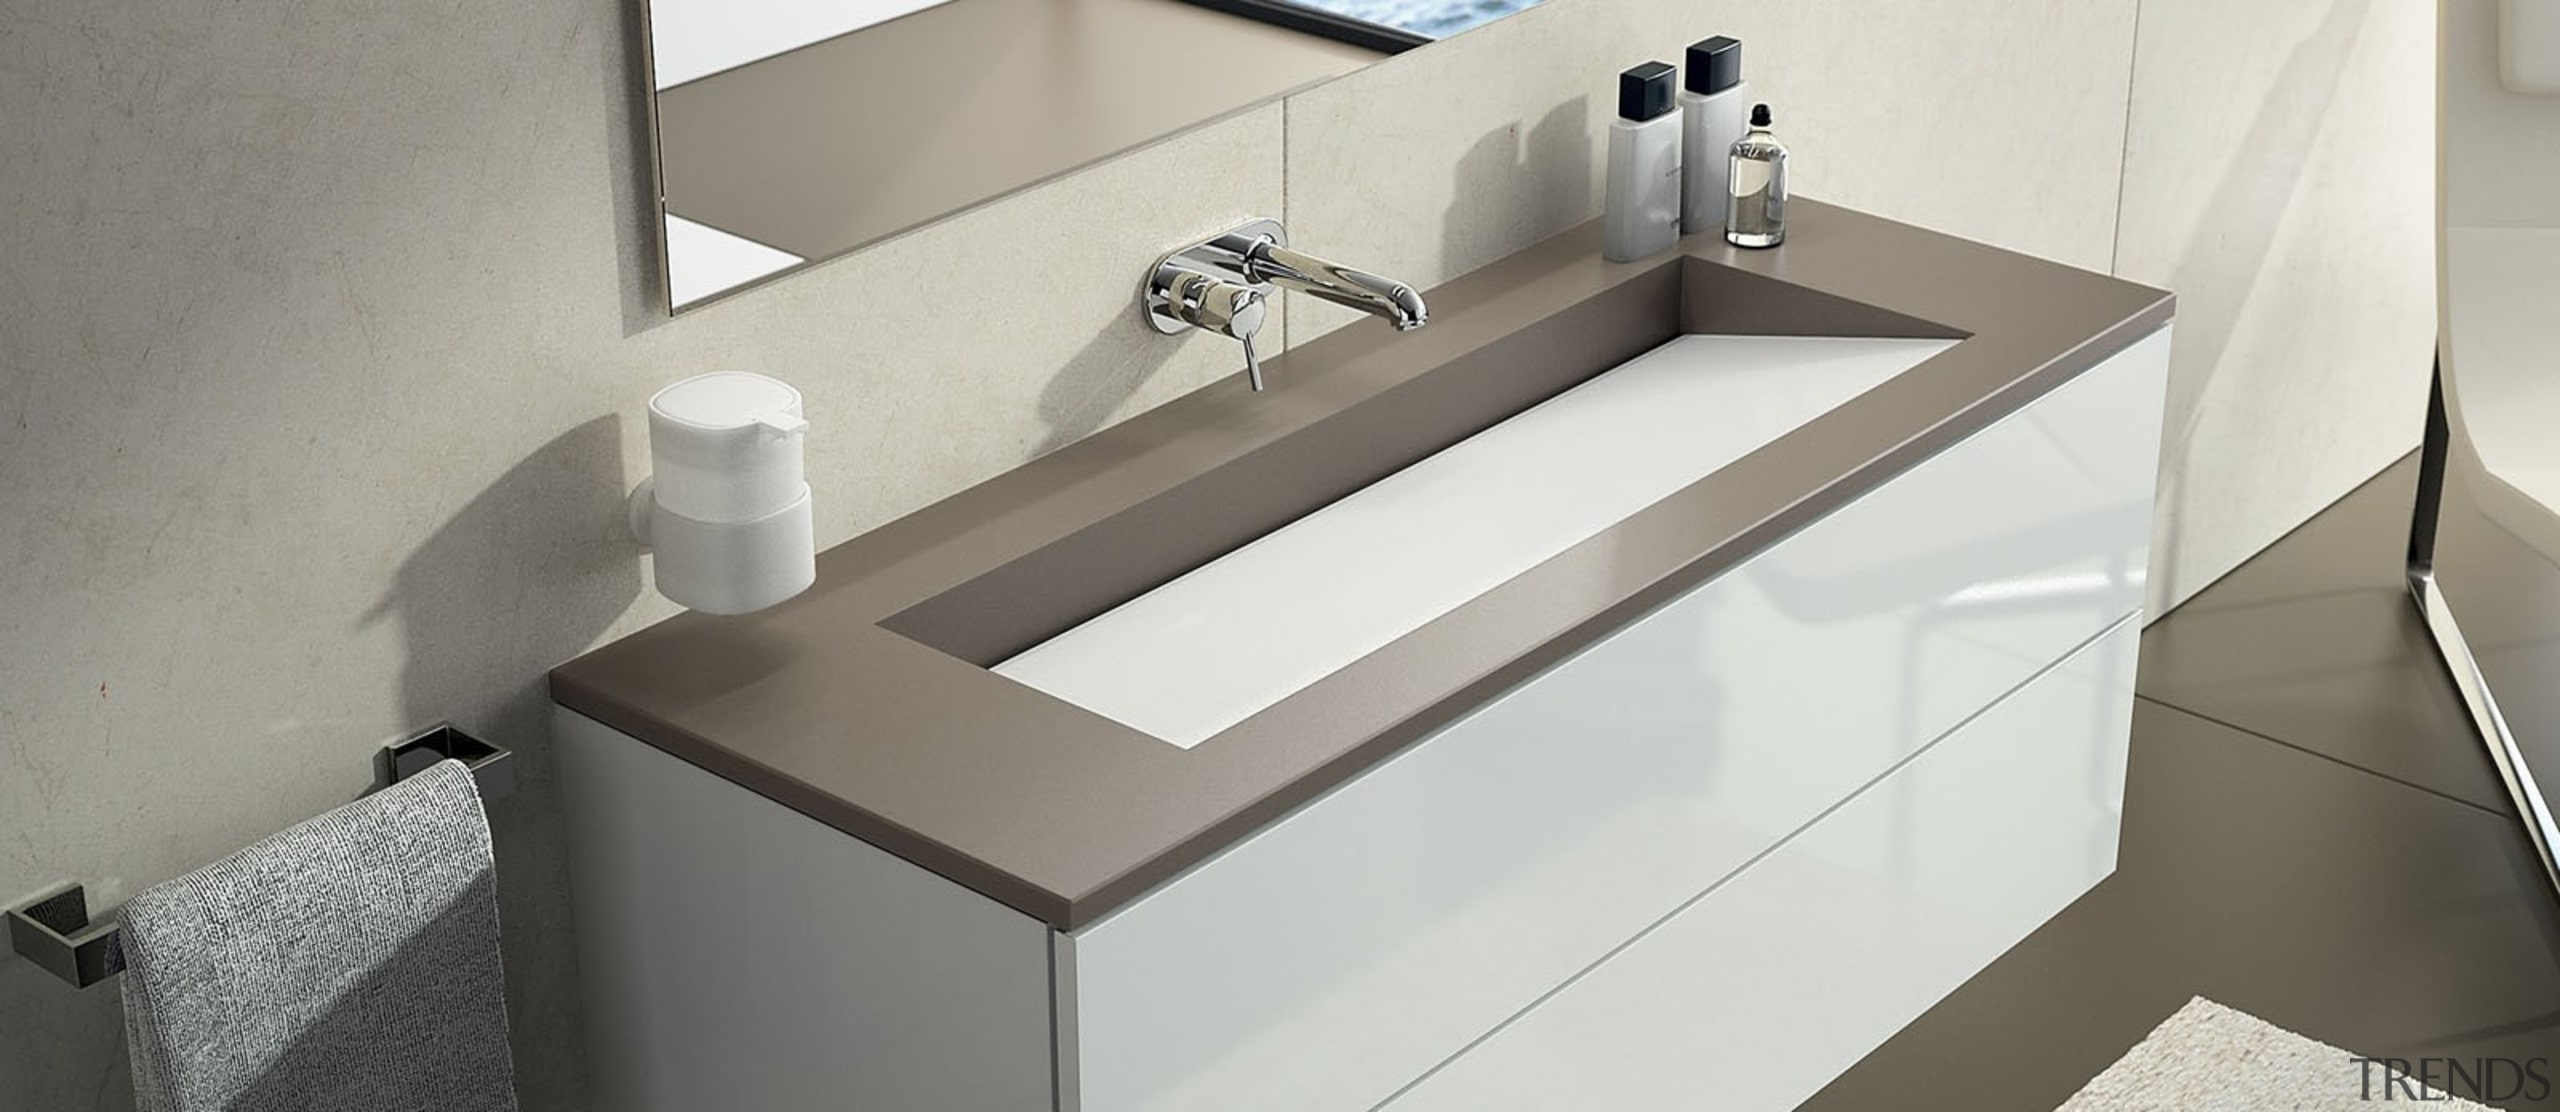 SILESTONE - BAÑO 4 BLANCO ZEUS + UNSUI angle, bathroom, bathroom sink, floor, furniture, interior design, plumbing fixture, product, product design, sink, tap, gray, white